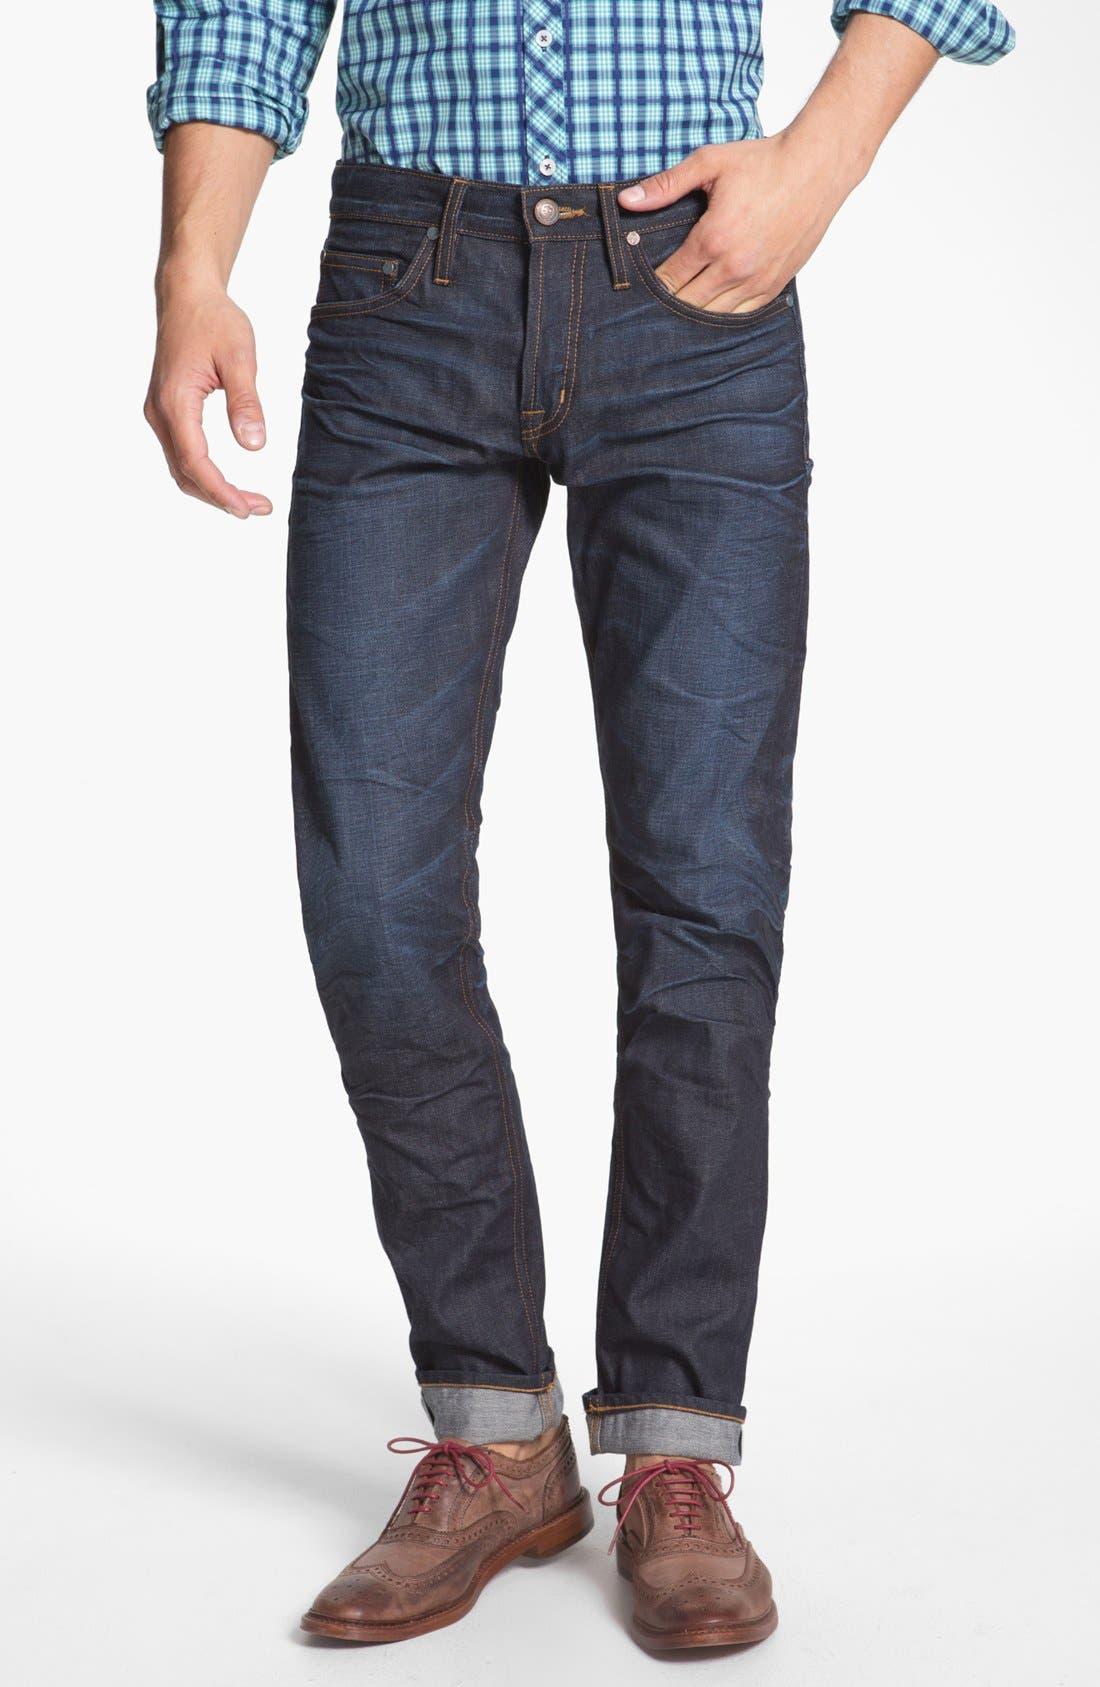 ASBURY PARK,                             '1888 Skinny Fit' Raw Selvedge Jeans,                             Main thumbnail 1, color,                             401